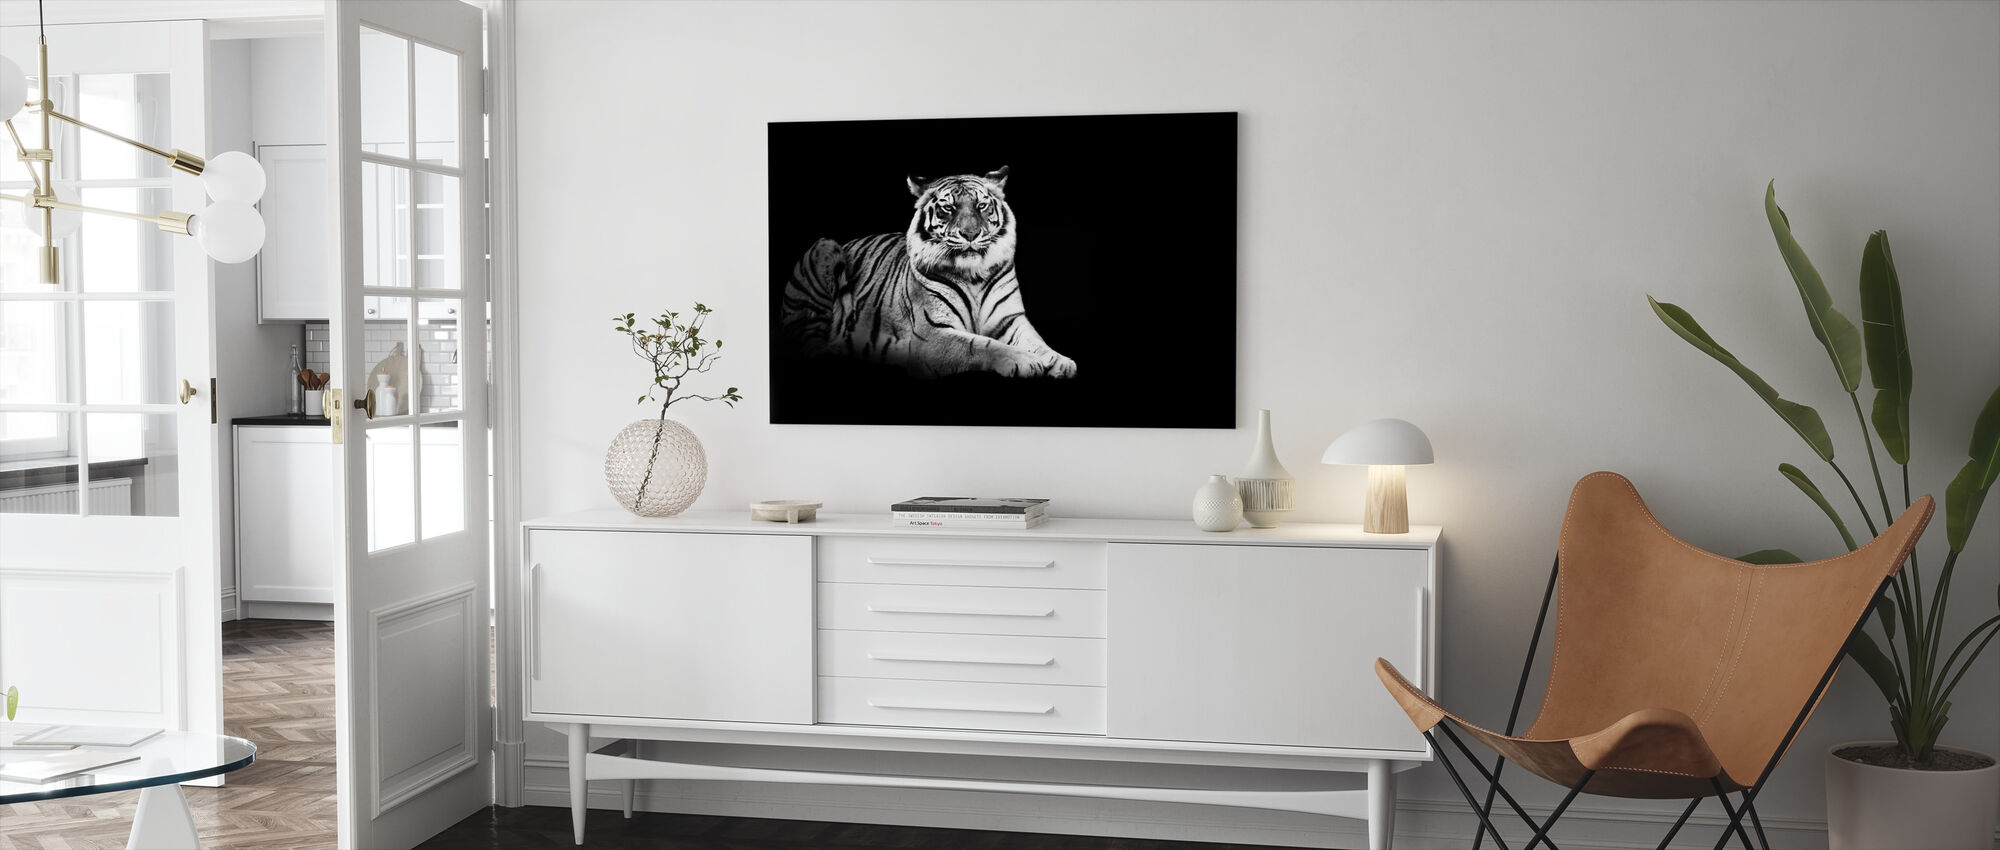 Don't Make a Fuss - Canvas print - Living Room